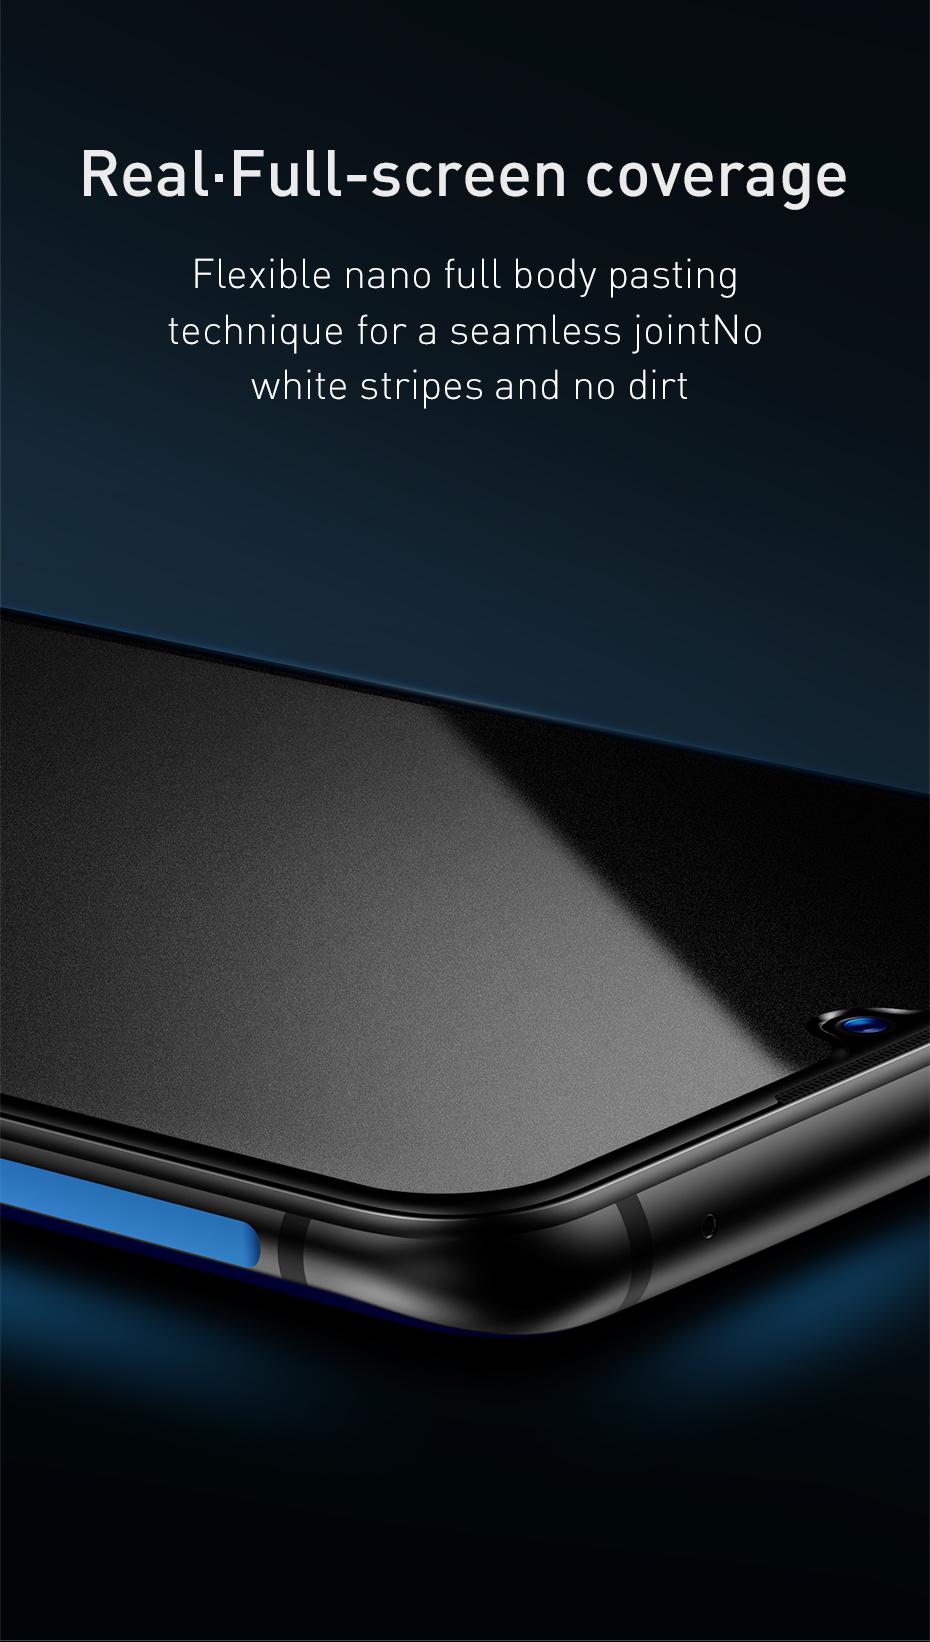 Baseus 0.3mm All-screen Arc-surface Anti-bluelight Tempered Glass Film For Vivo X23iQOO Black_8.jpg